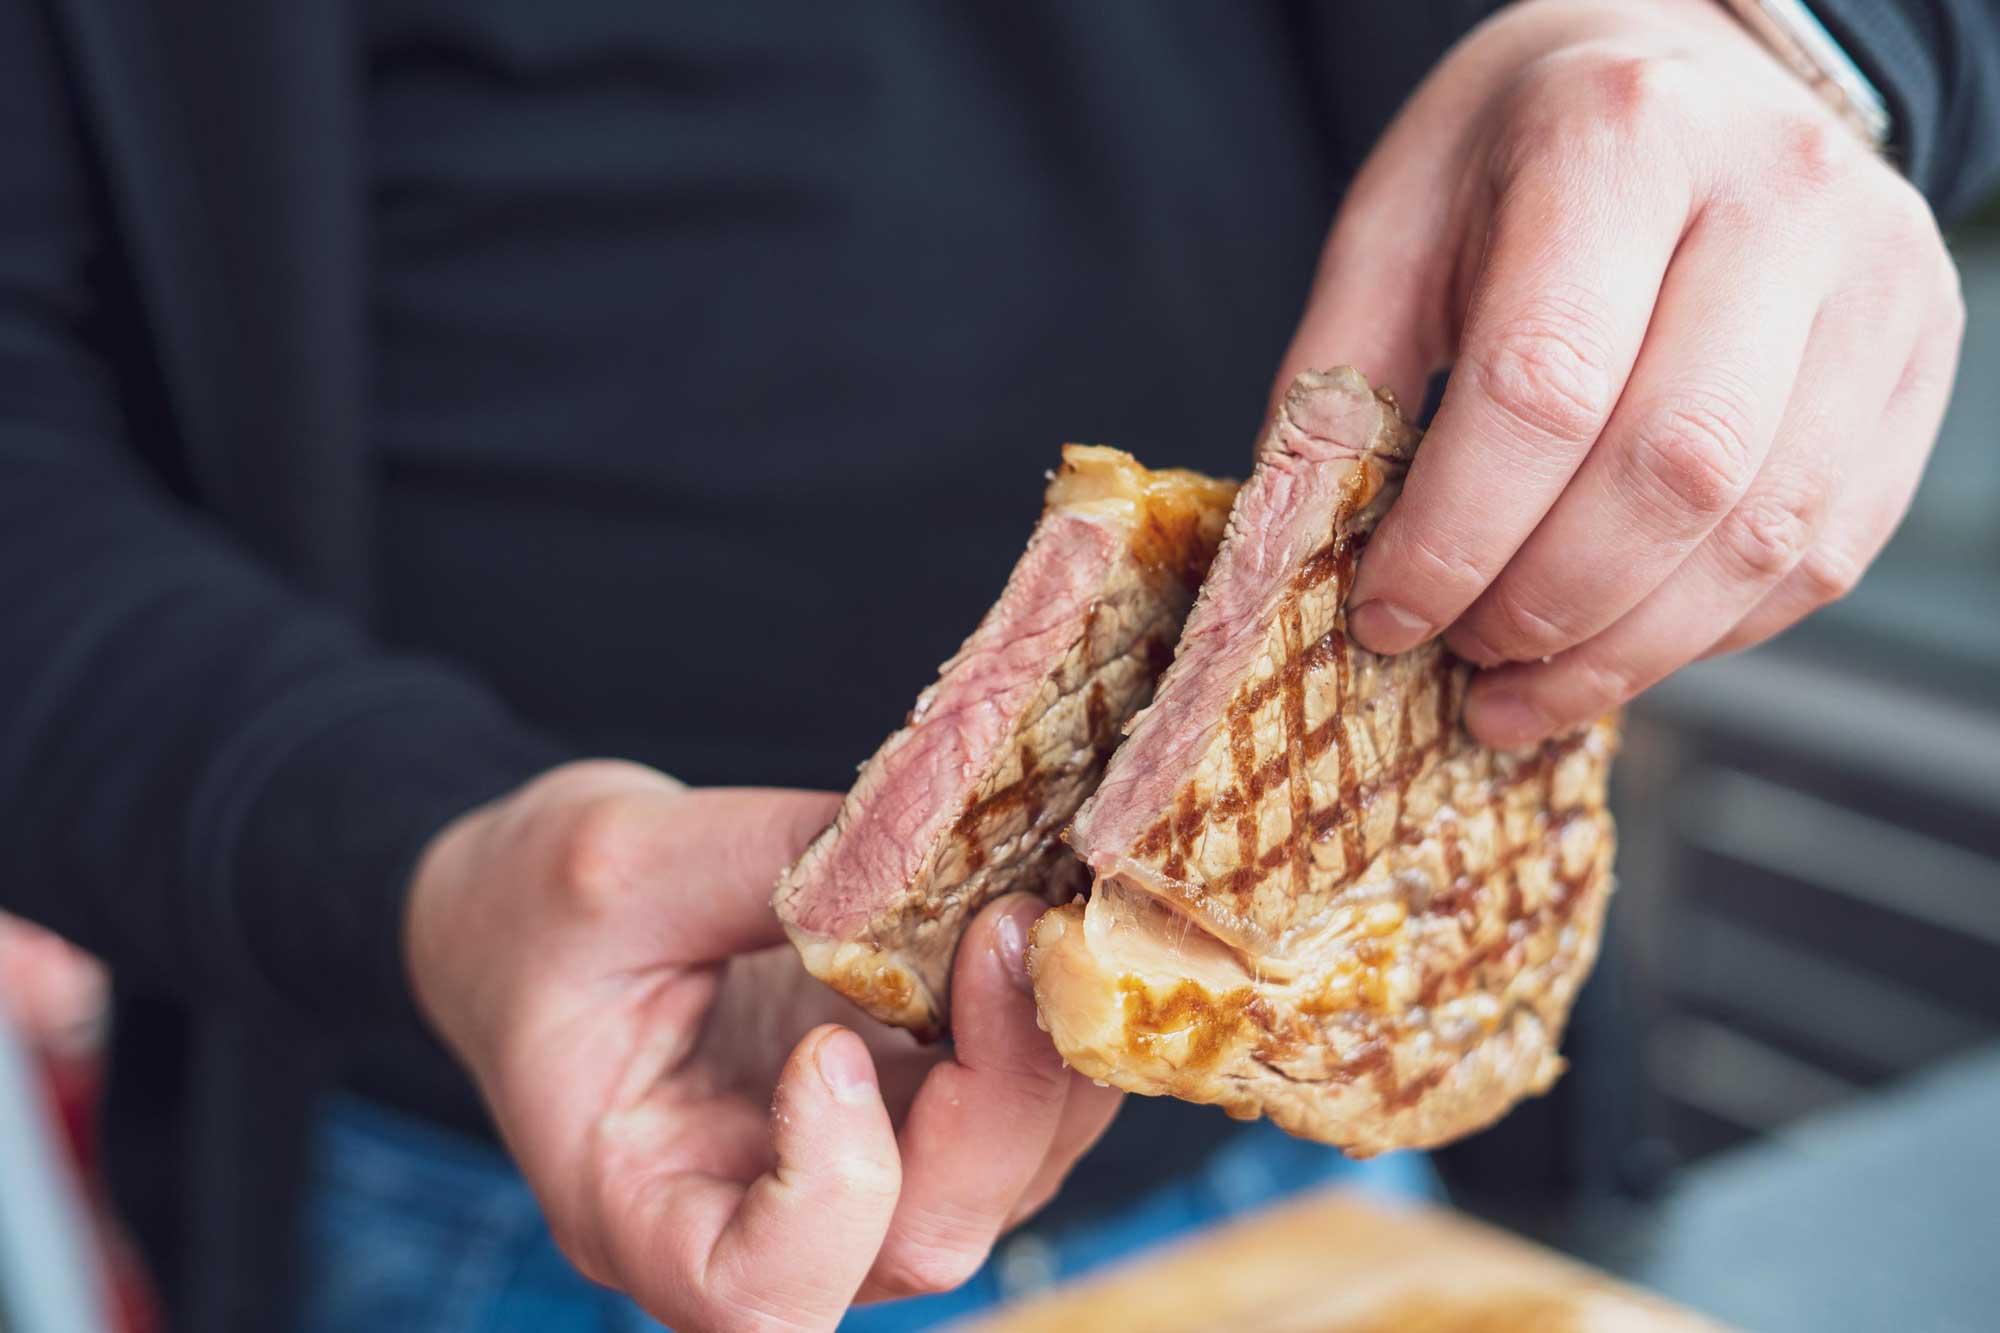 steak_in_alufolie_grillen_gargrad